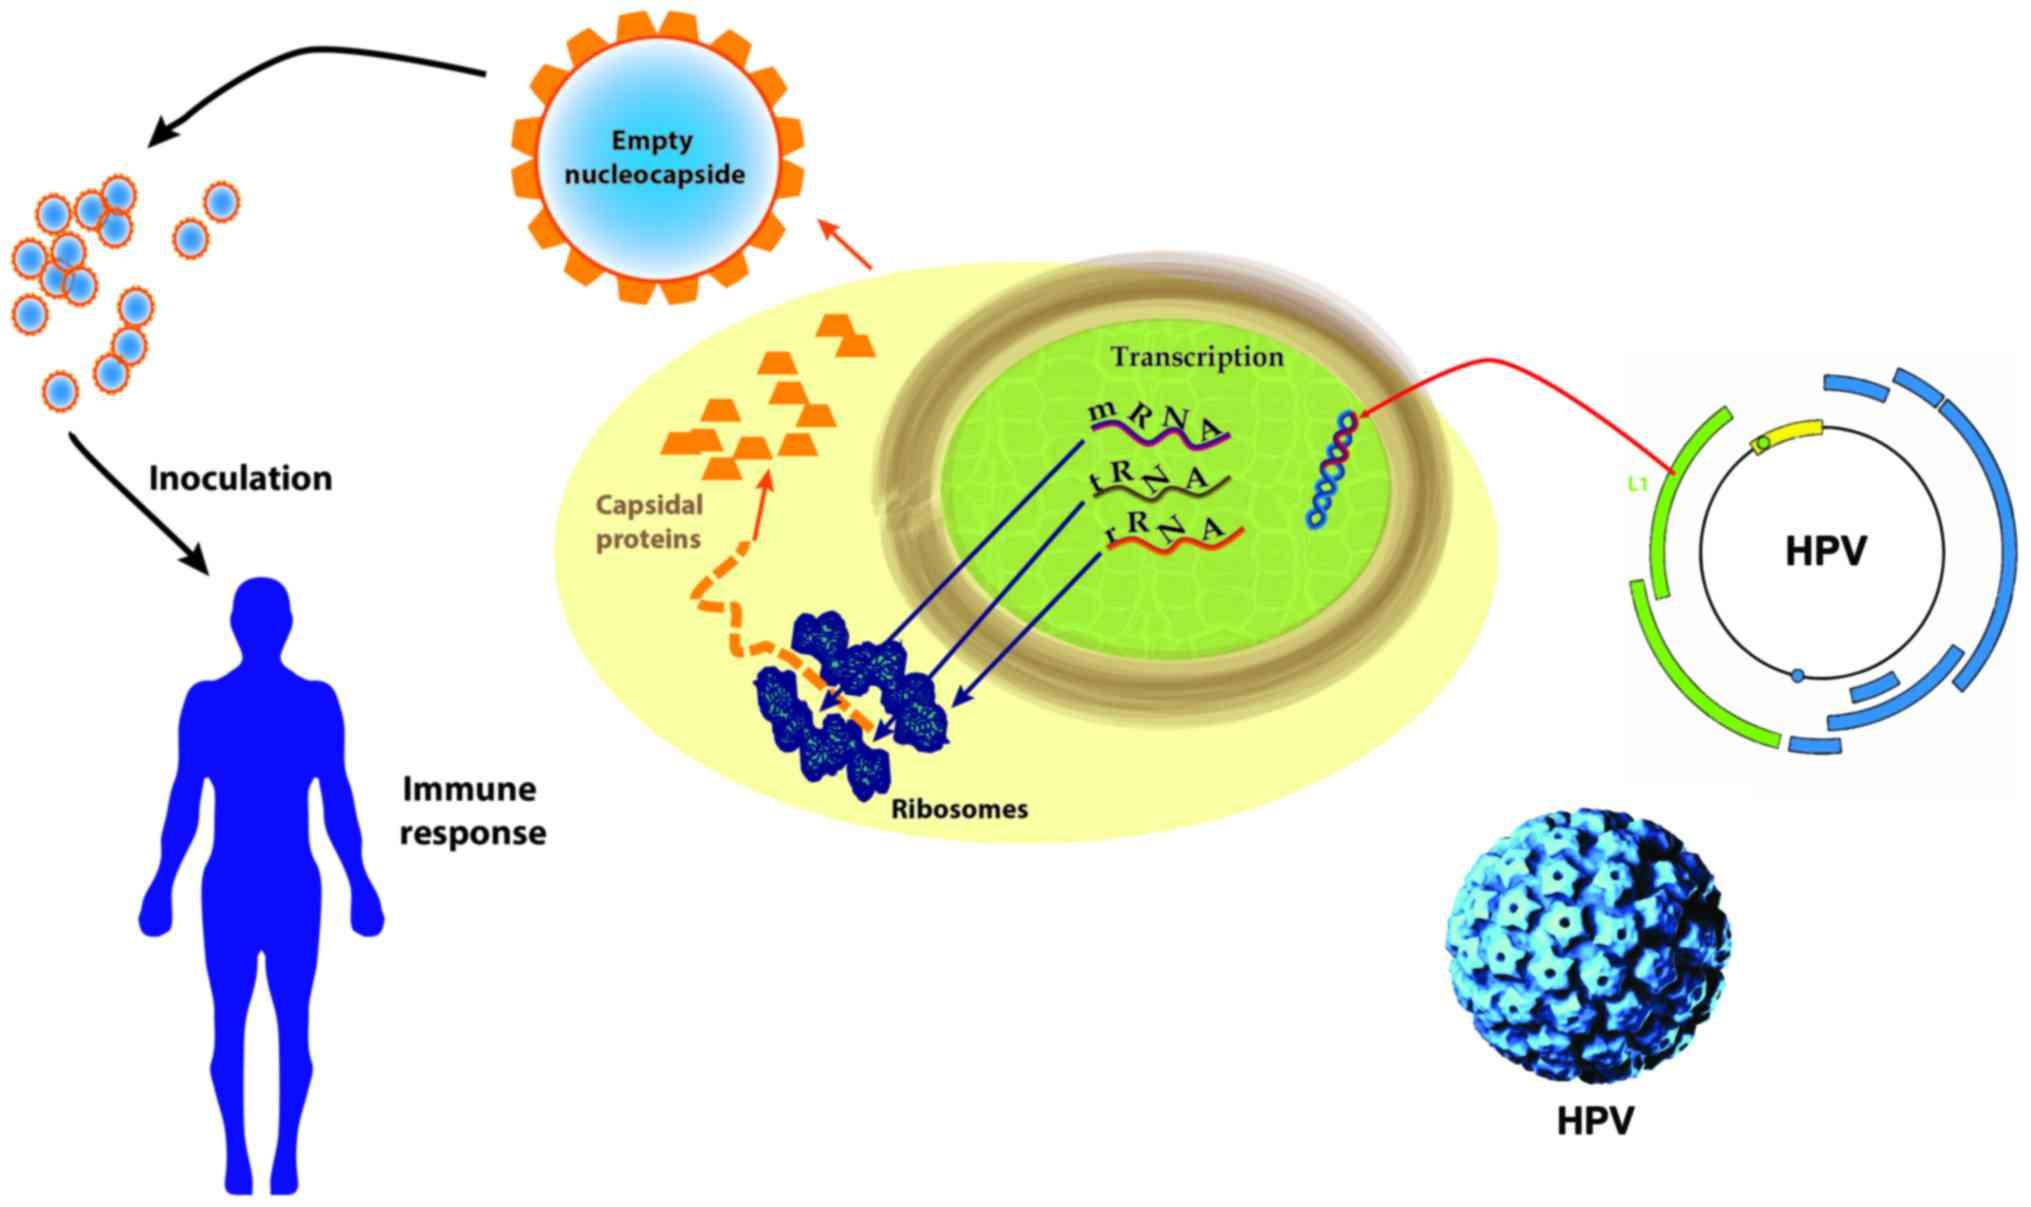 human papillomavirus? life cycle and carcinogenesis